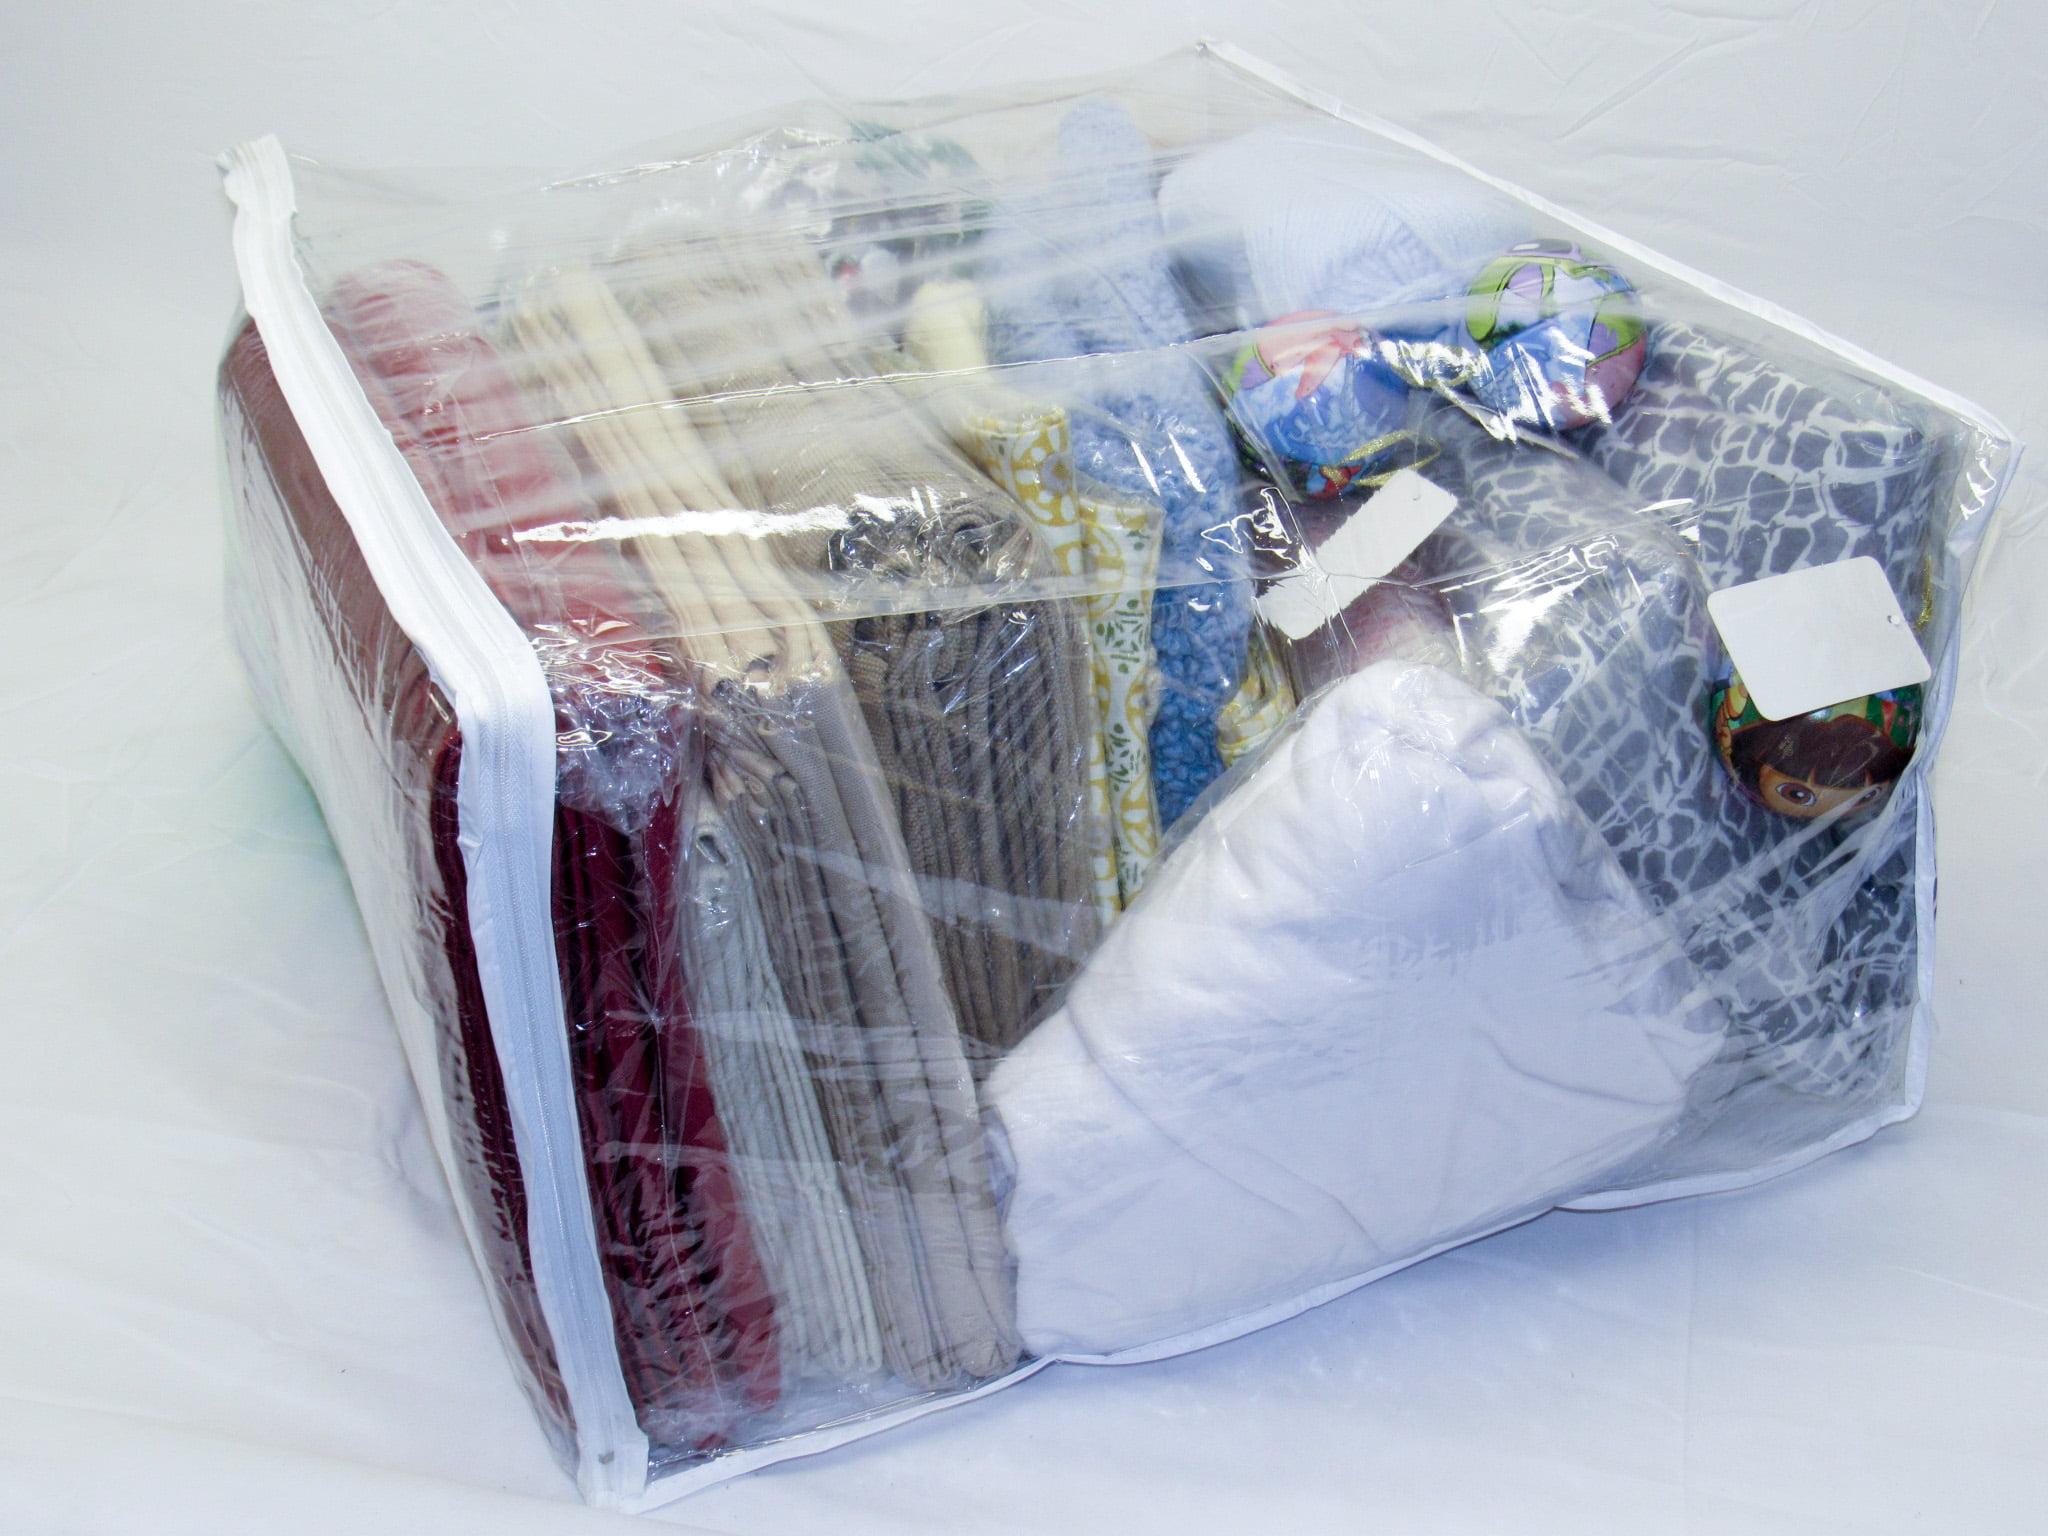 Jumbo Heavy Duty Vinyl Zippered Storage Bags Clear For